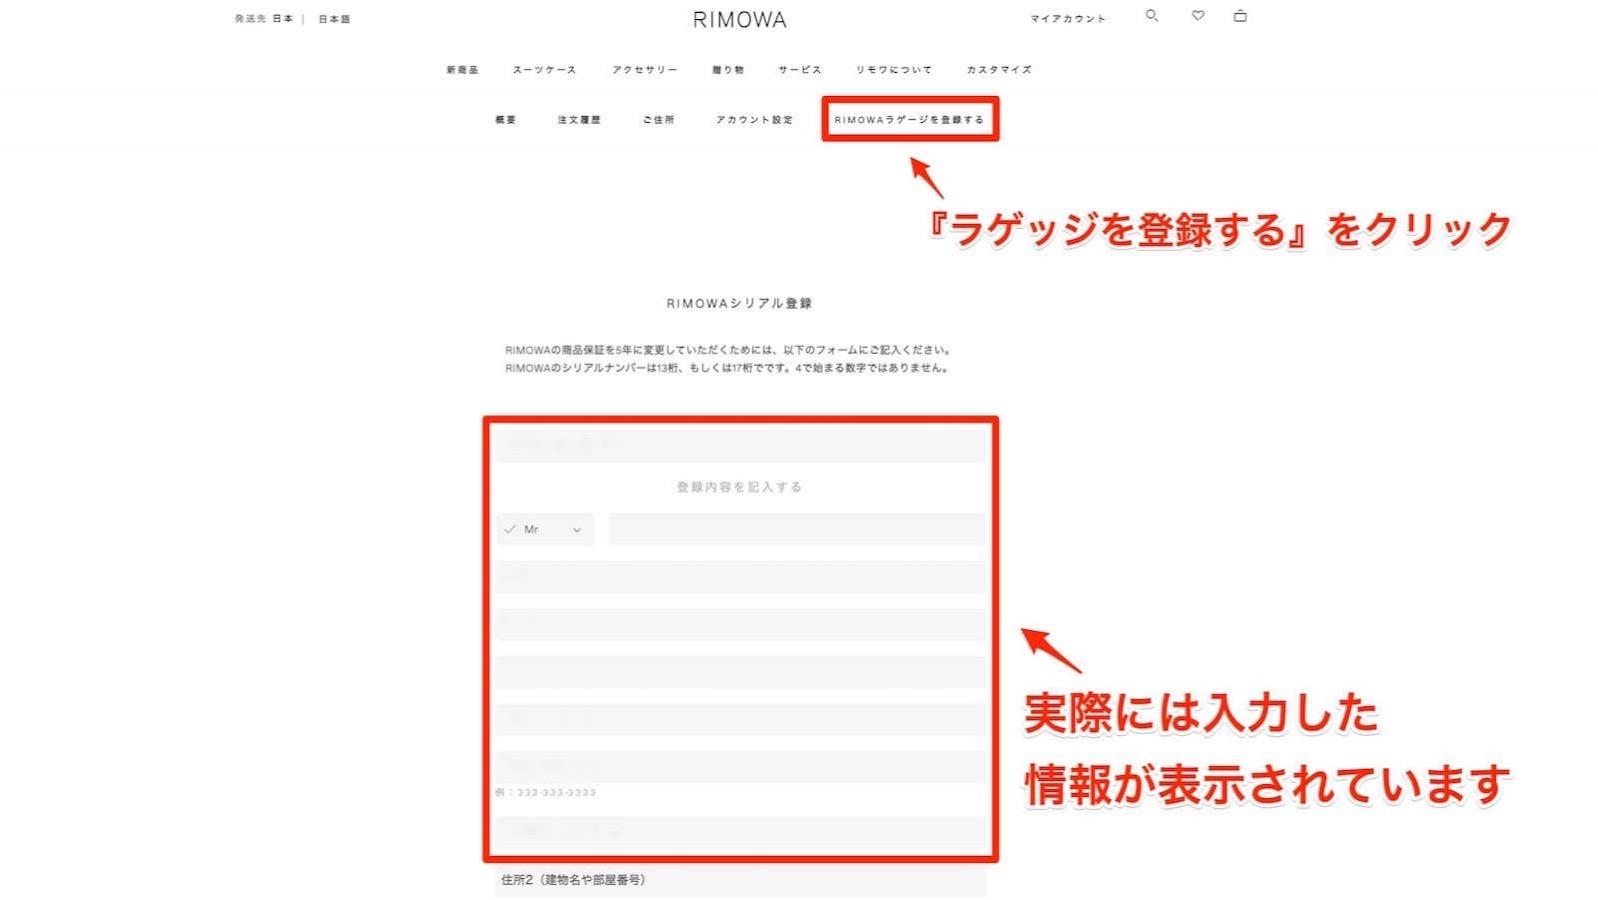 0229 Rimowa online registration method 13